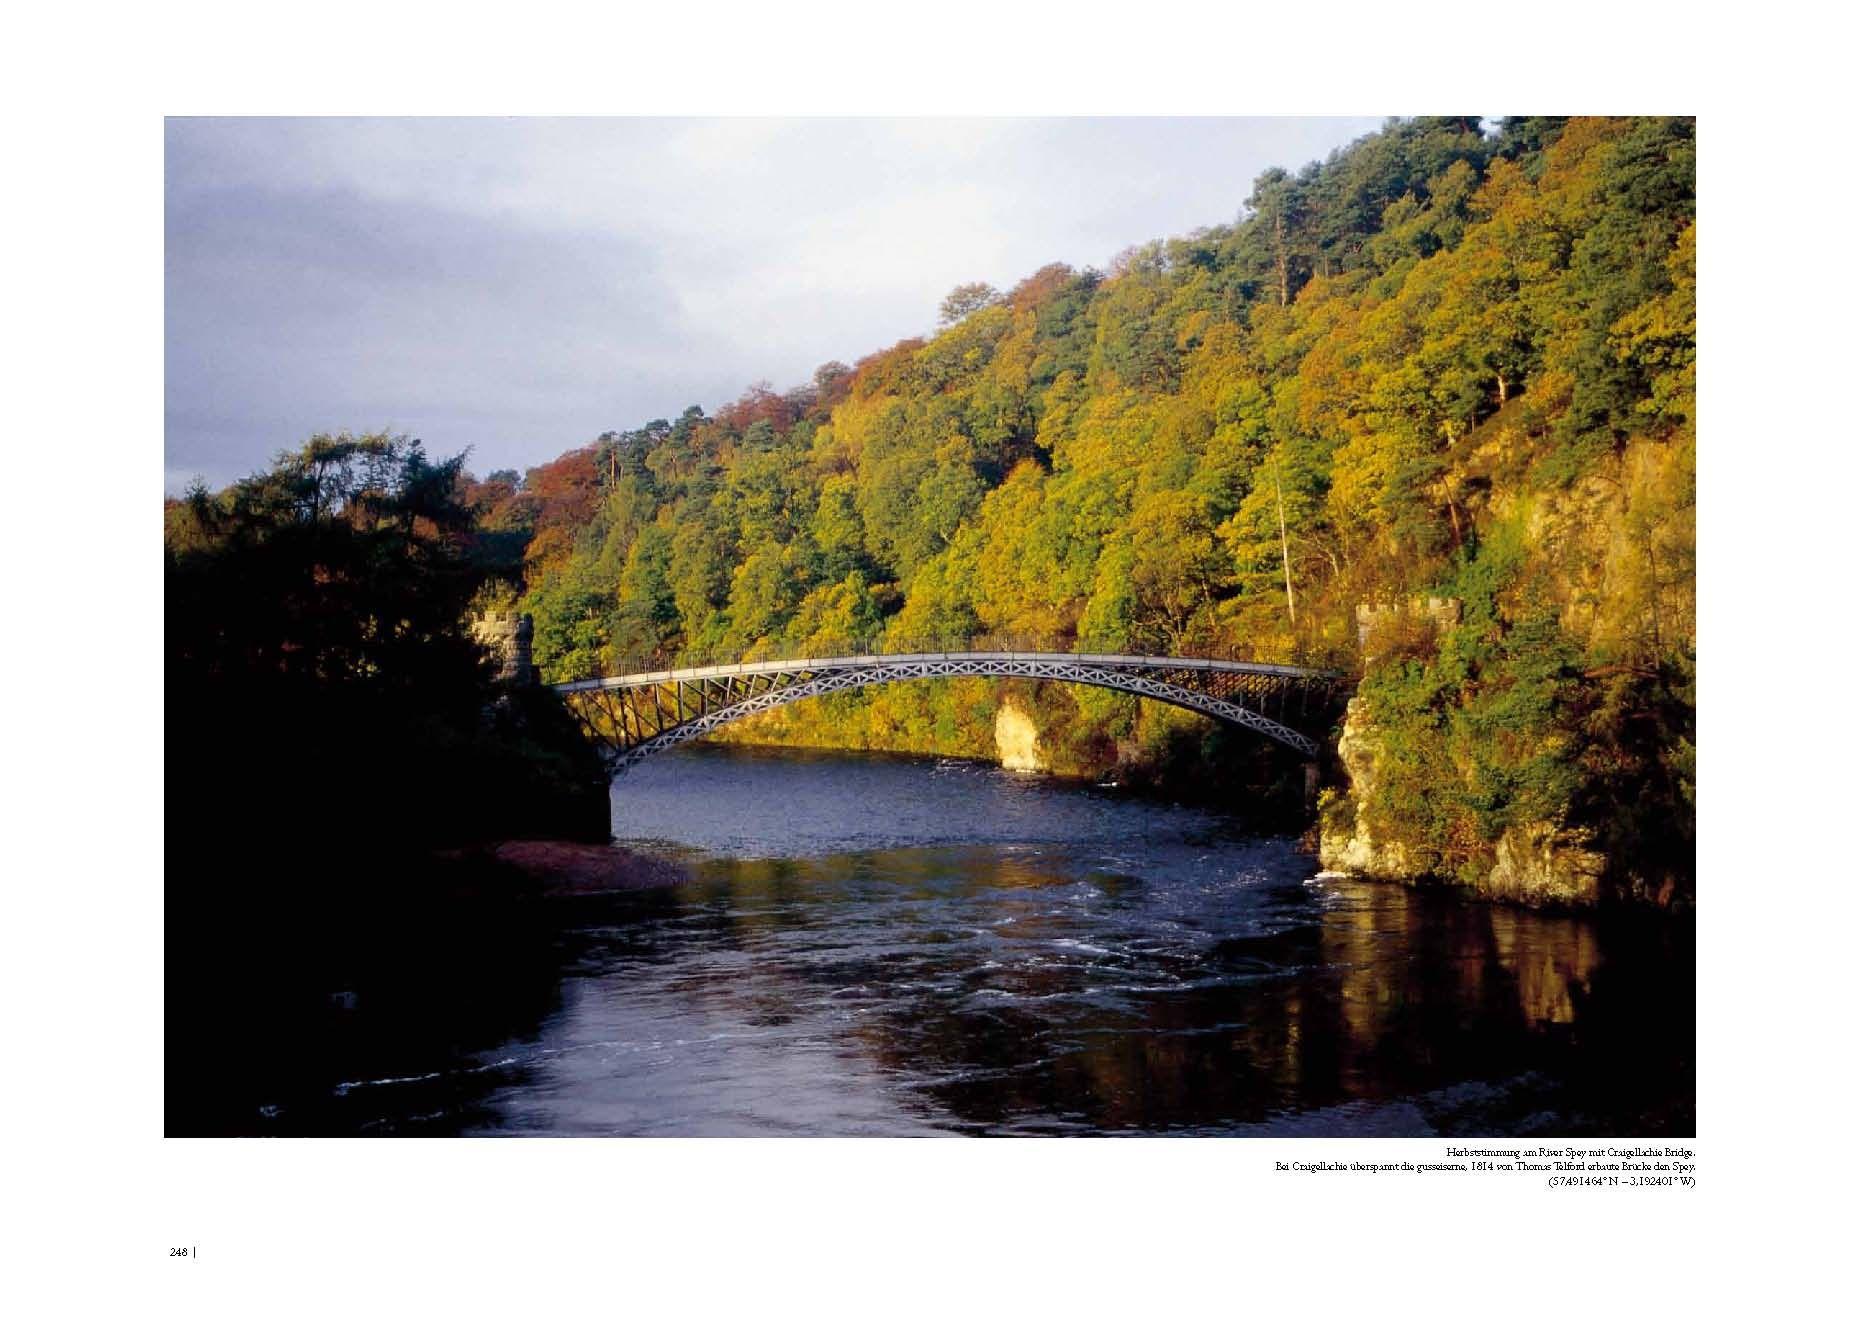 page 248 - River Spey with Telford bridge (©Big Book Schottland · R.J.Hirst · www.alba-collection.com)